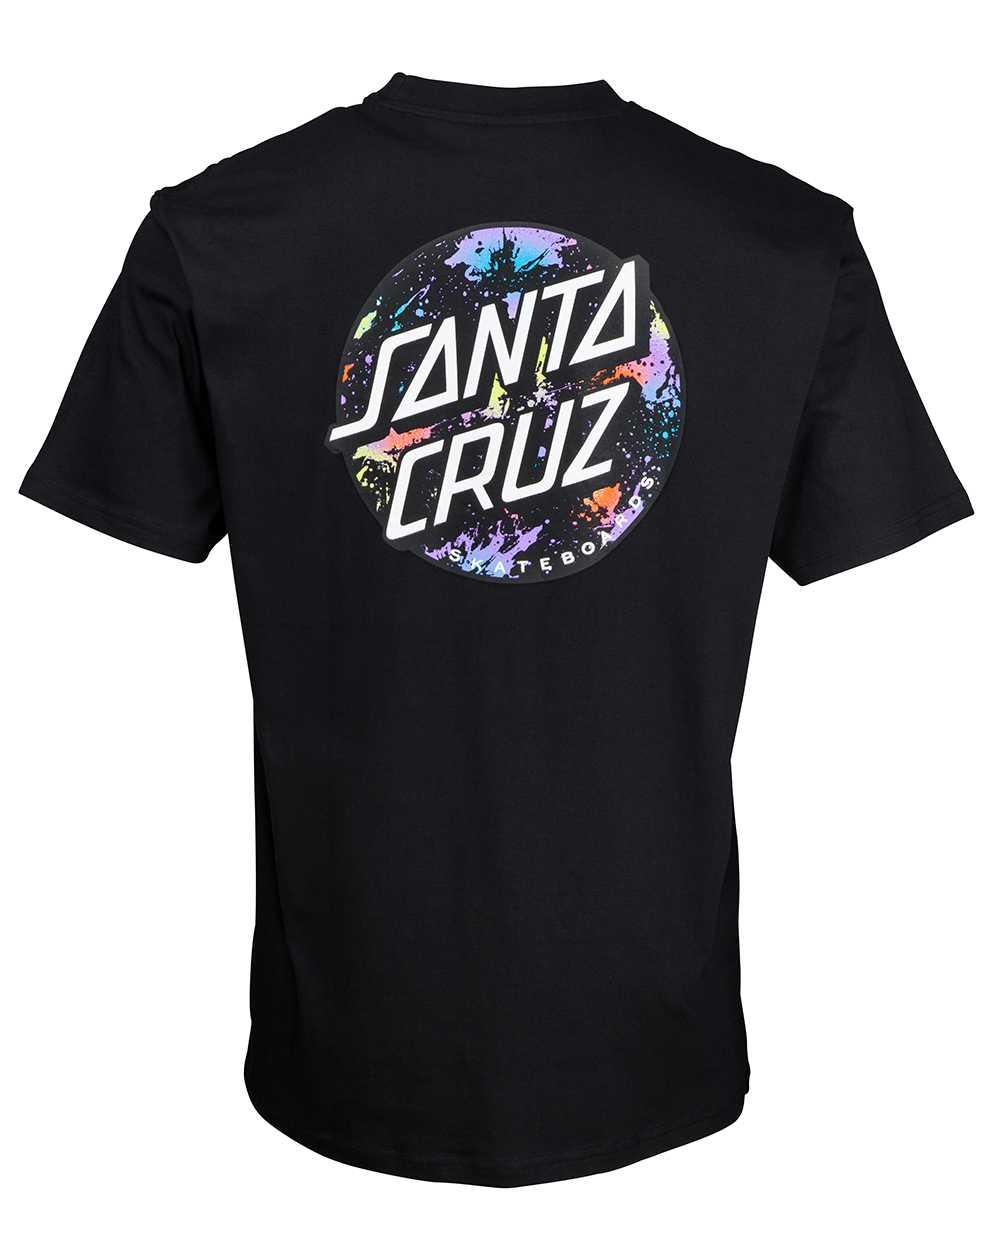 Santa Cruz Men's T-Shirt Dot Splatter Black